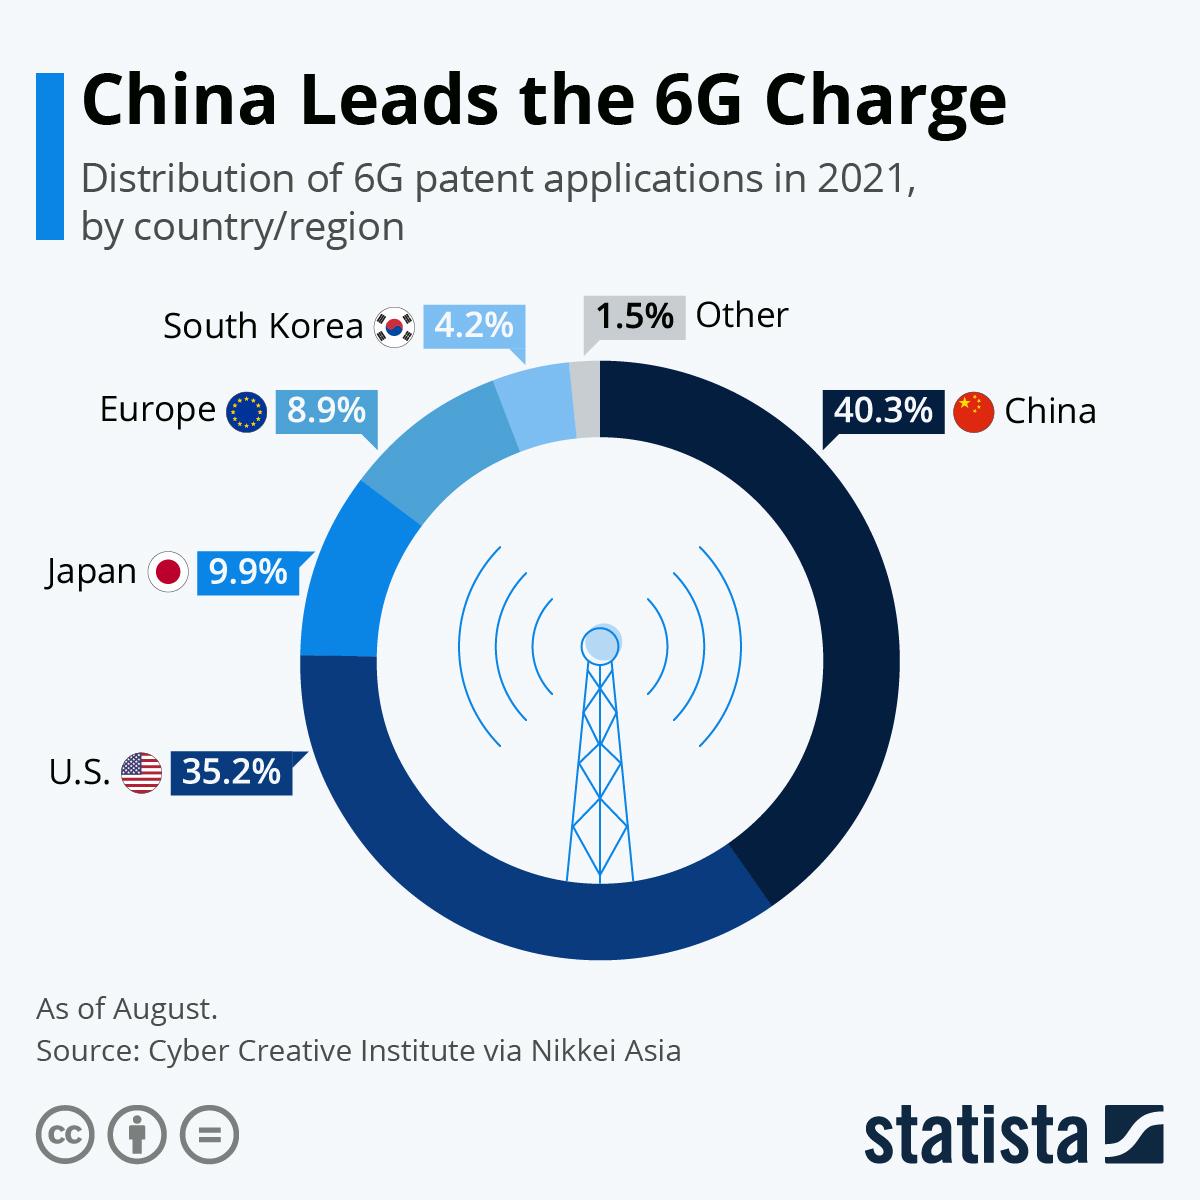 Infographic: Η Κίνα ηγείται της χρέωσης 6G |  Statista